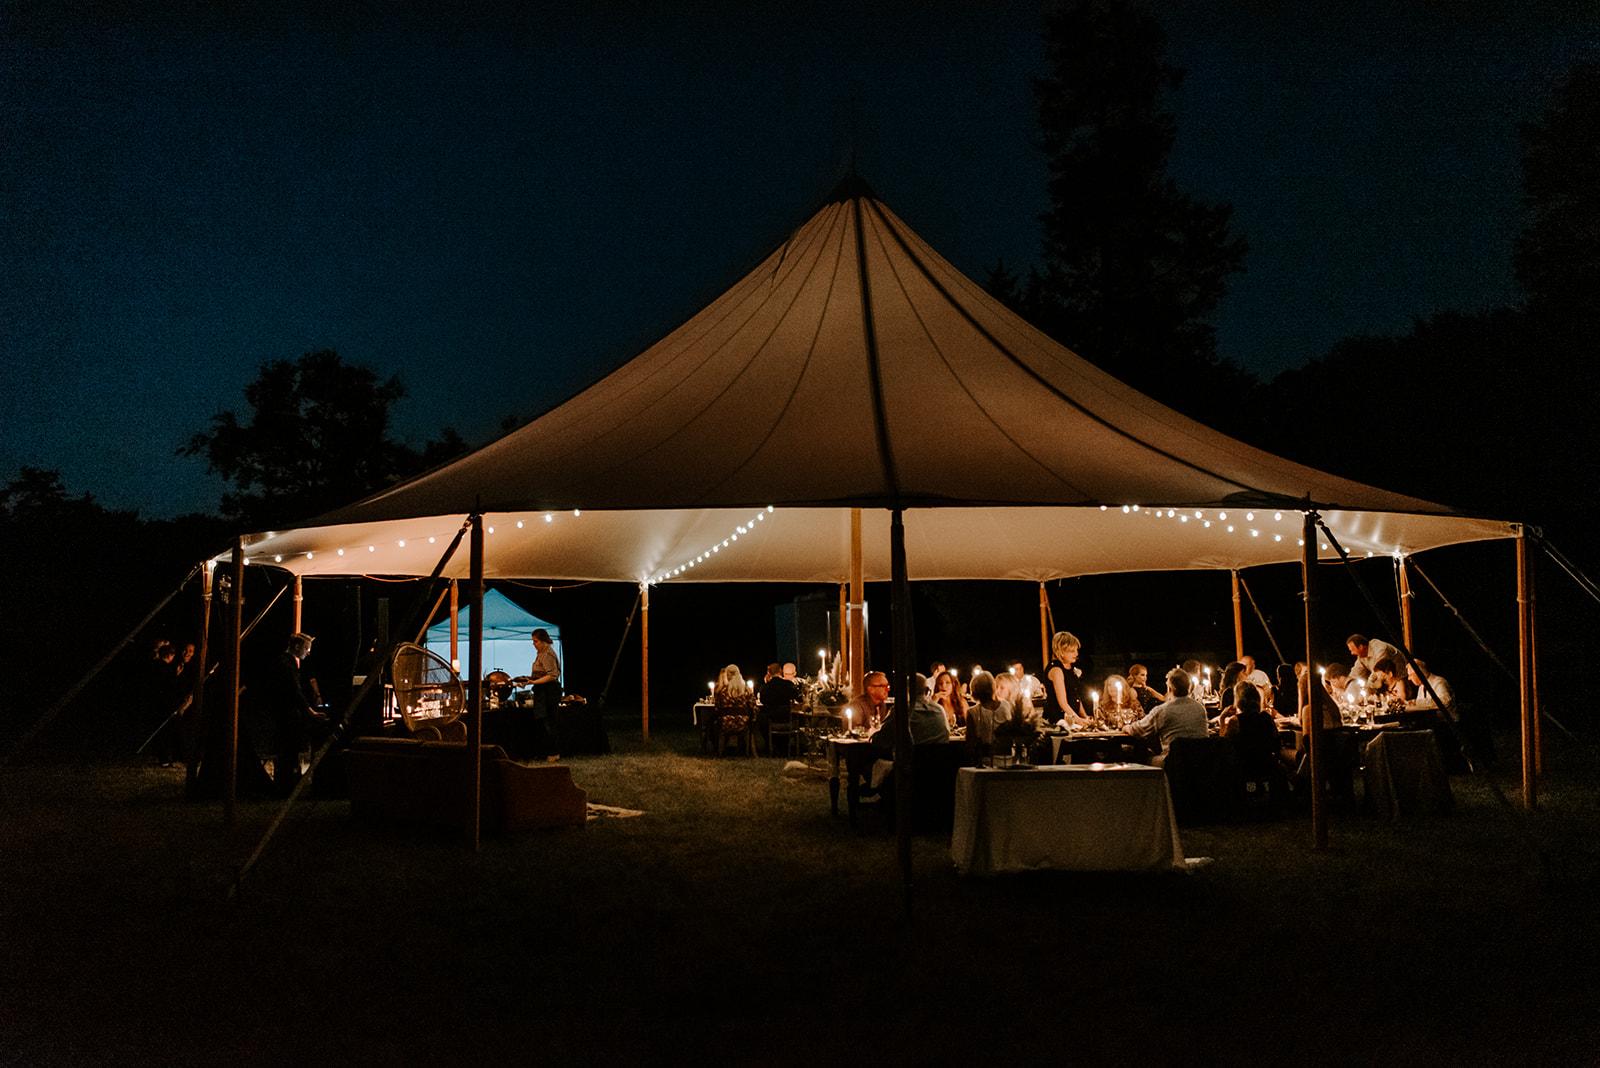 Outdoor Sail Tent Nashville wedding featured on Nashville Bride Guide